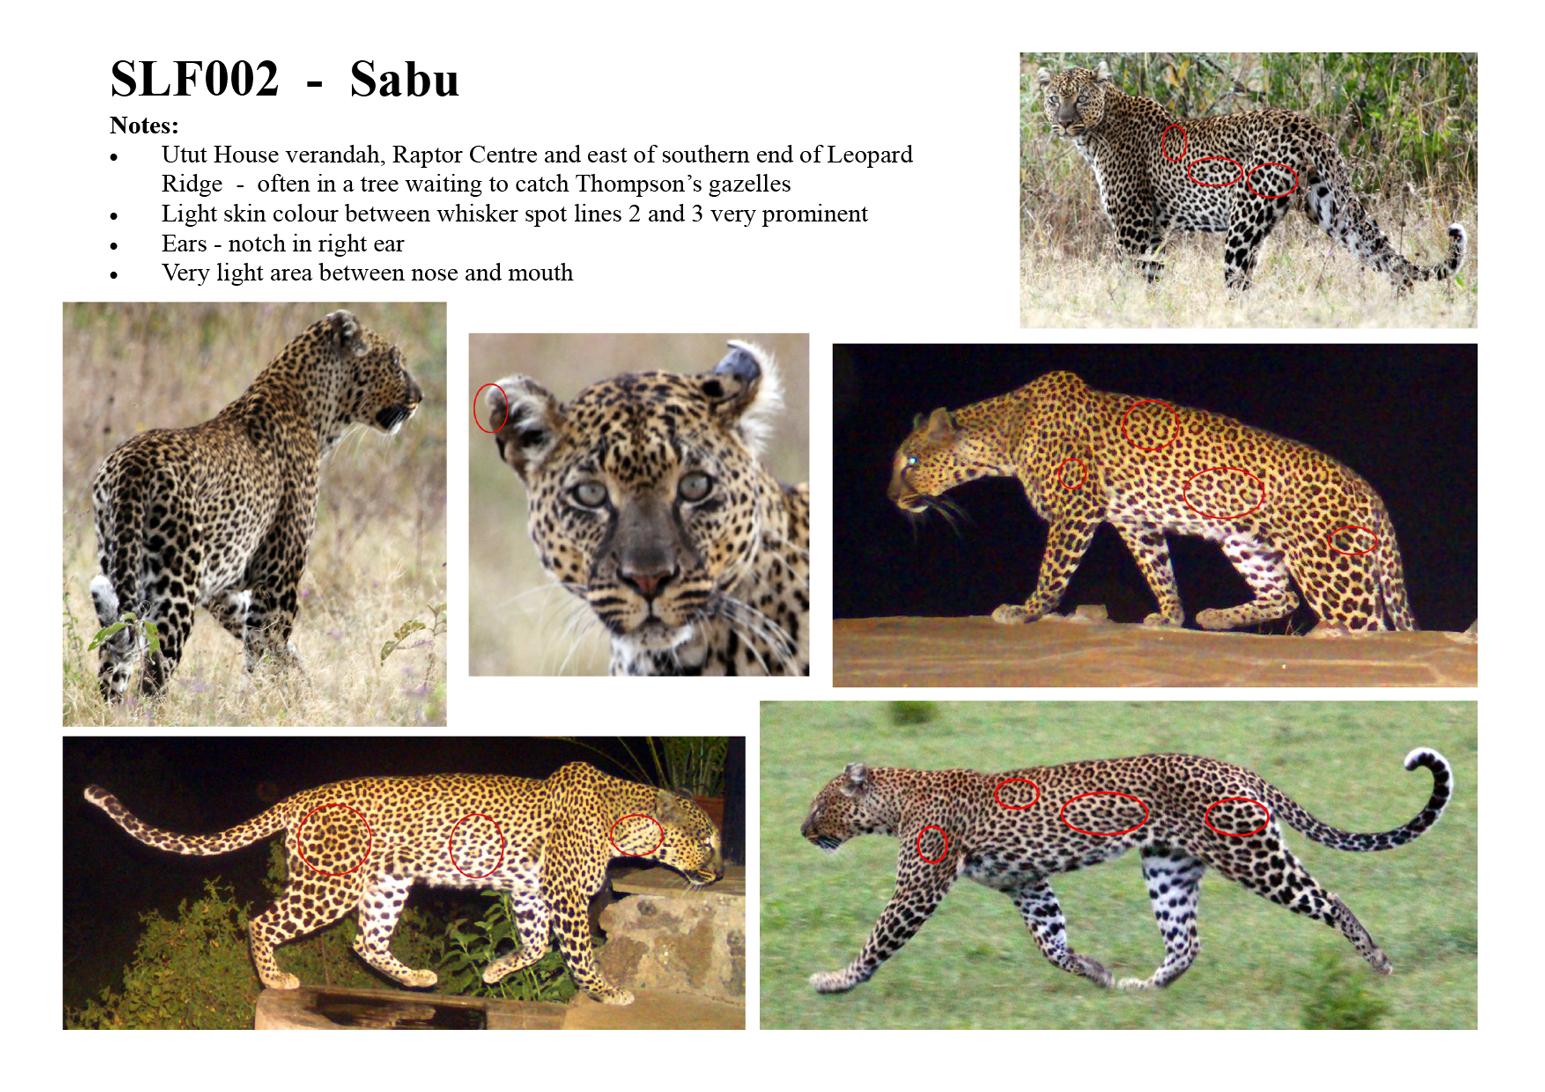 Sabu – SLF002